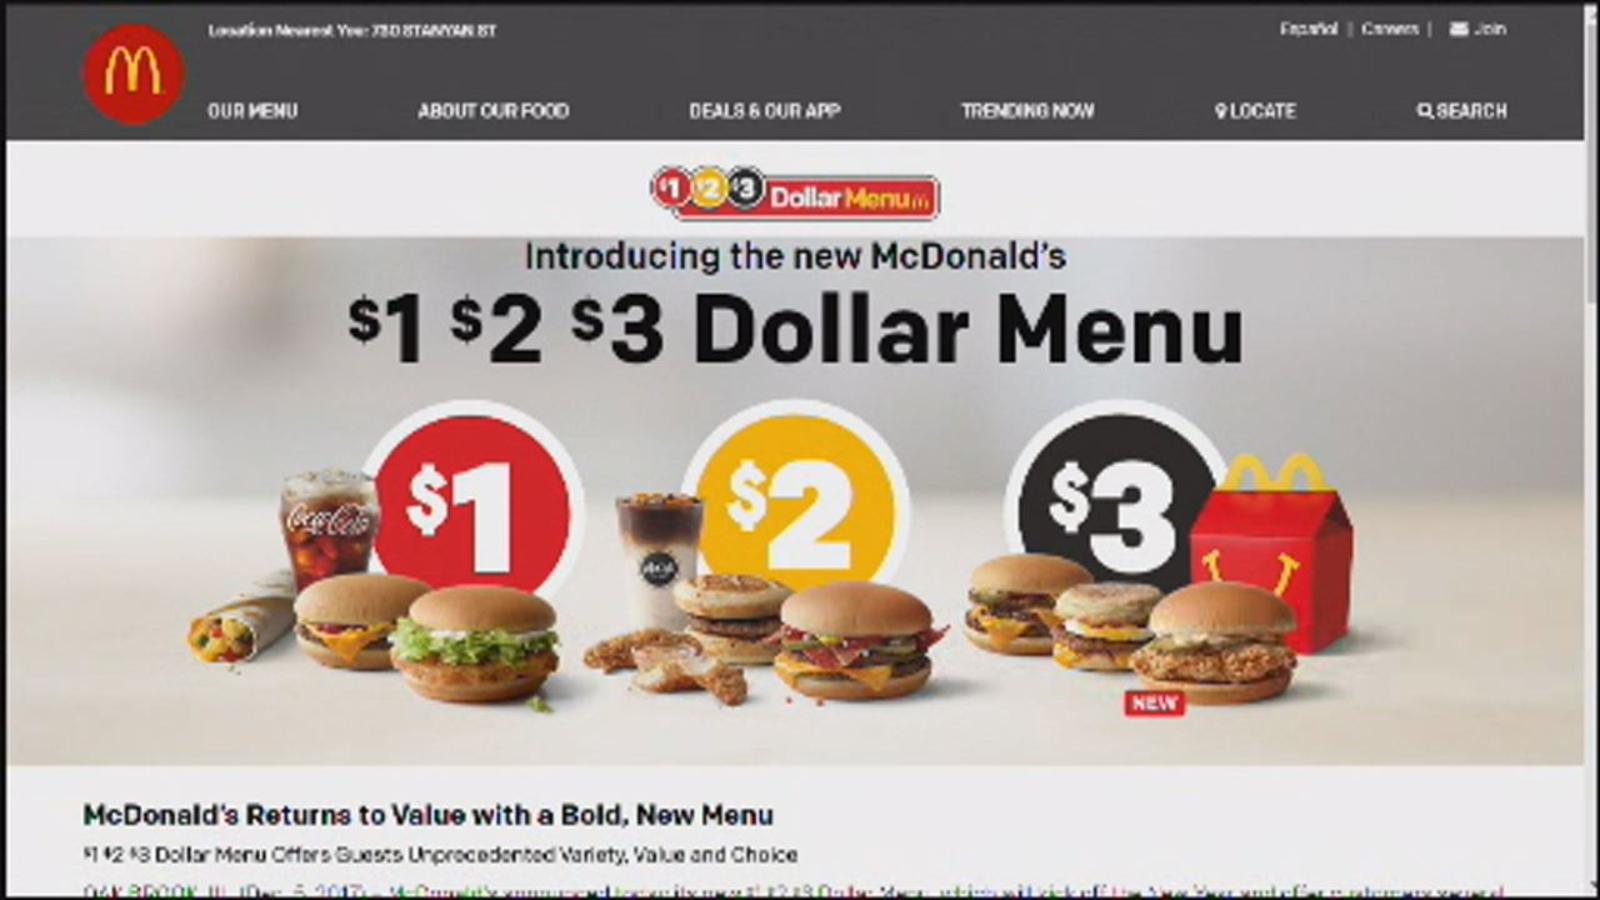 Mcdonalds New Dollar Menu 2020.Mcdonald S New Dollar Menu To Make Debut